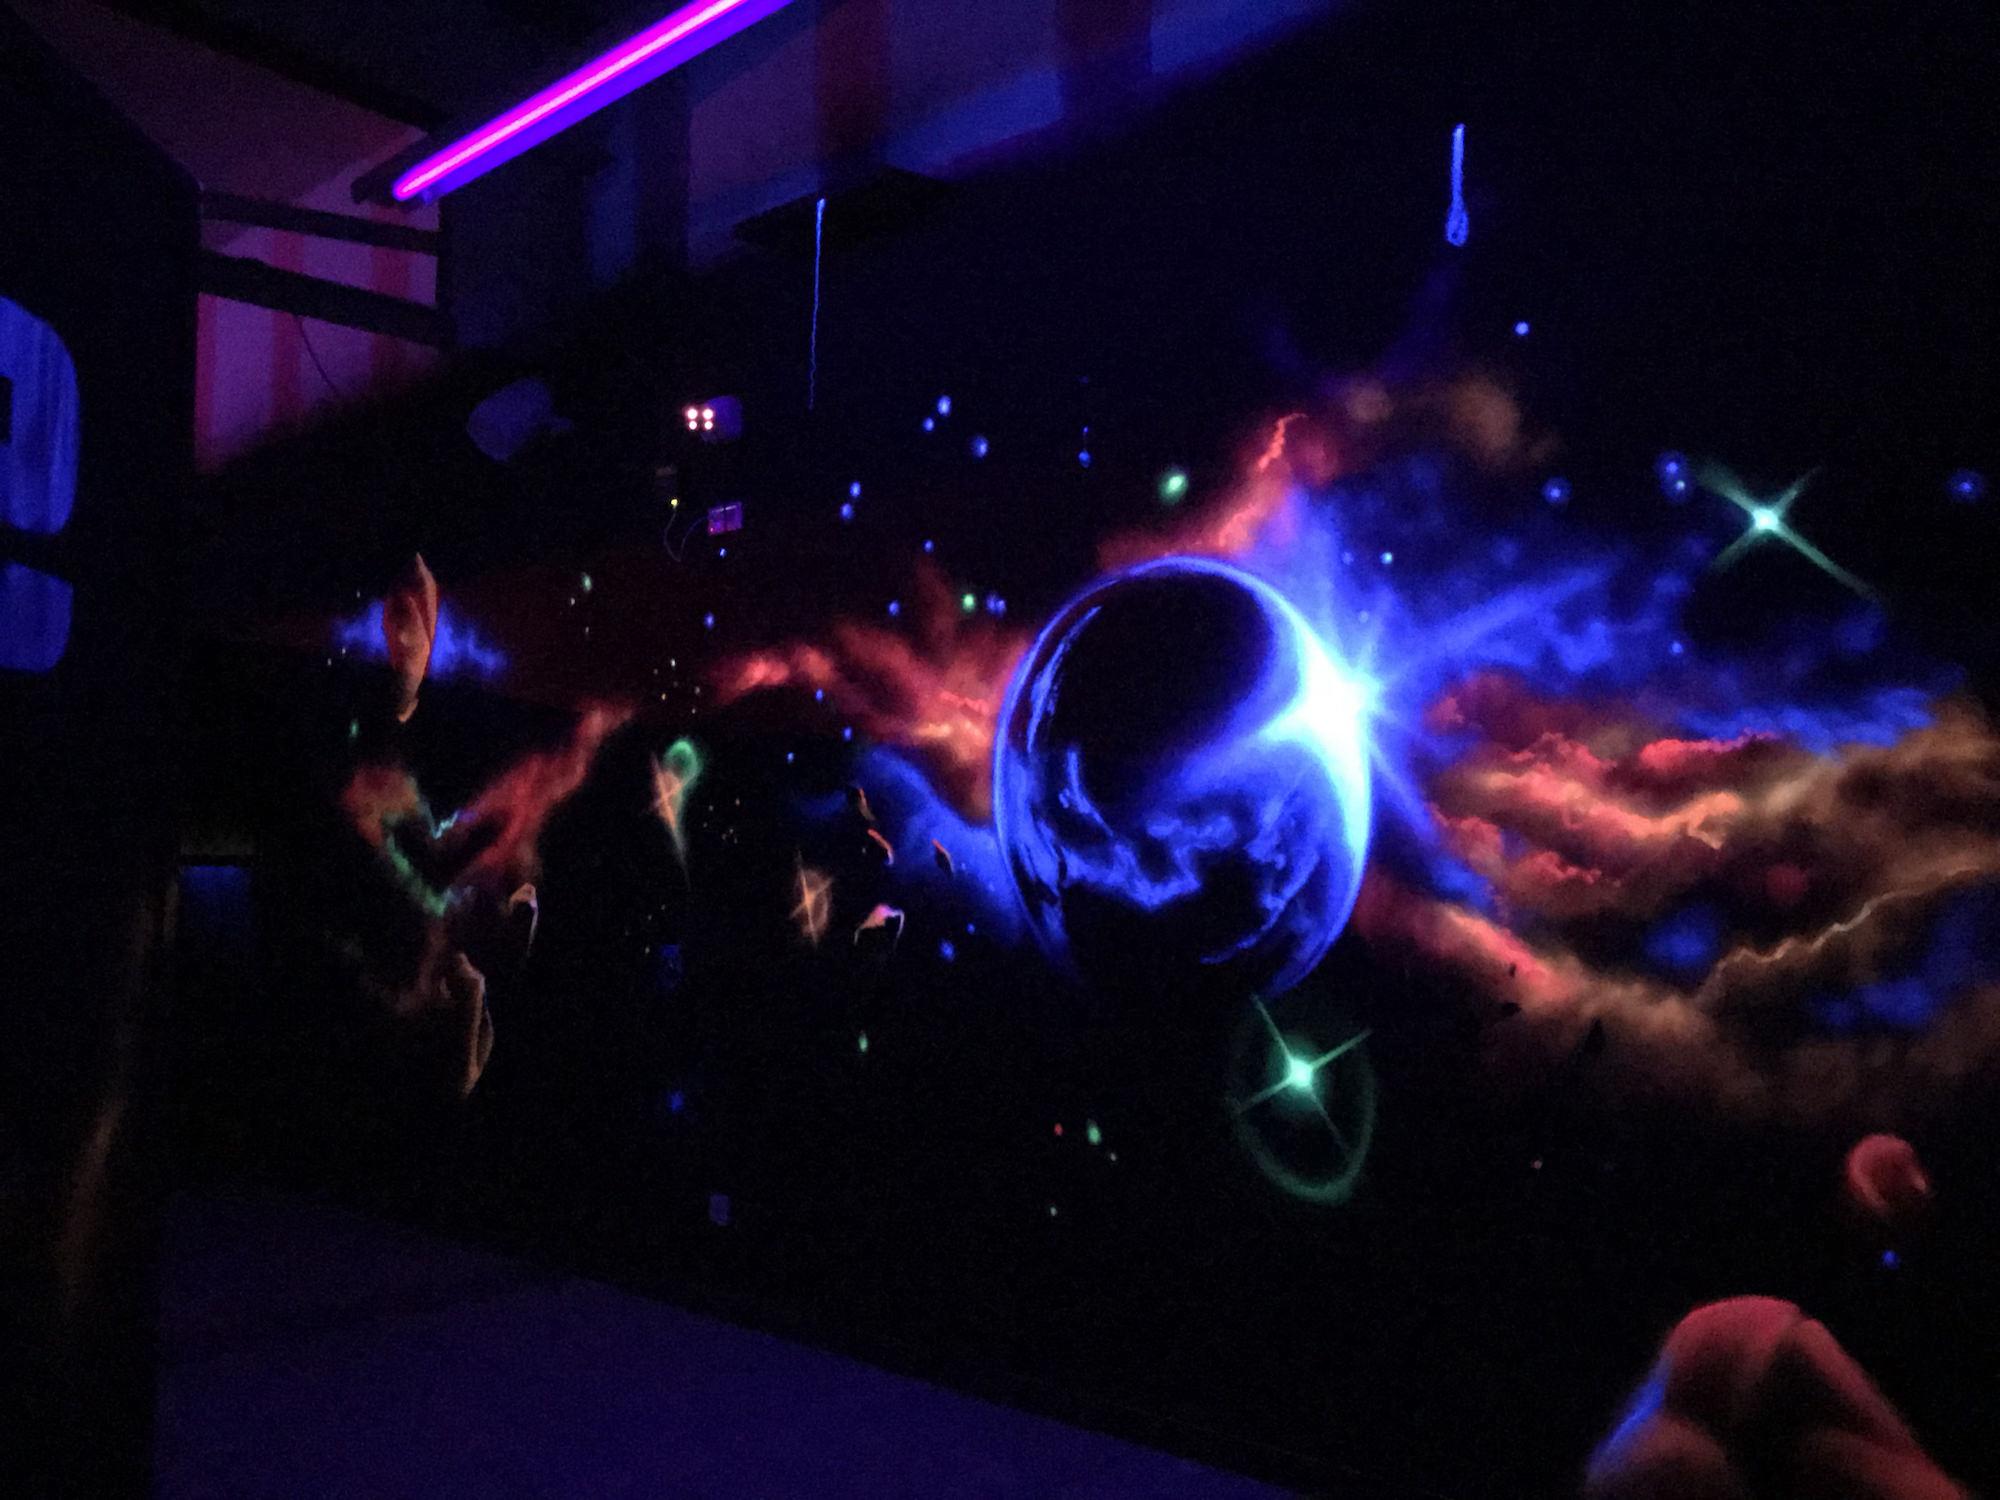 07-graffiti-decor-fresque-peinture-fluo-lumiere-noire